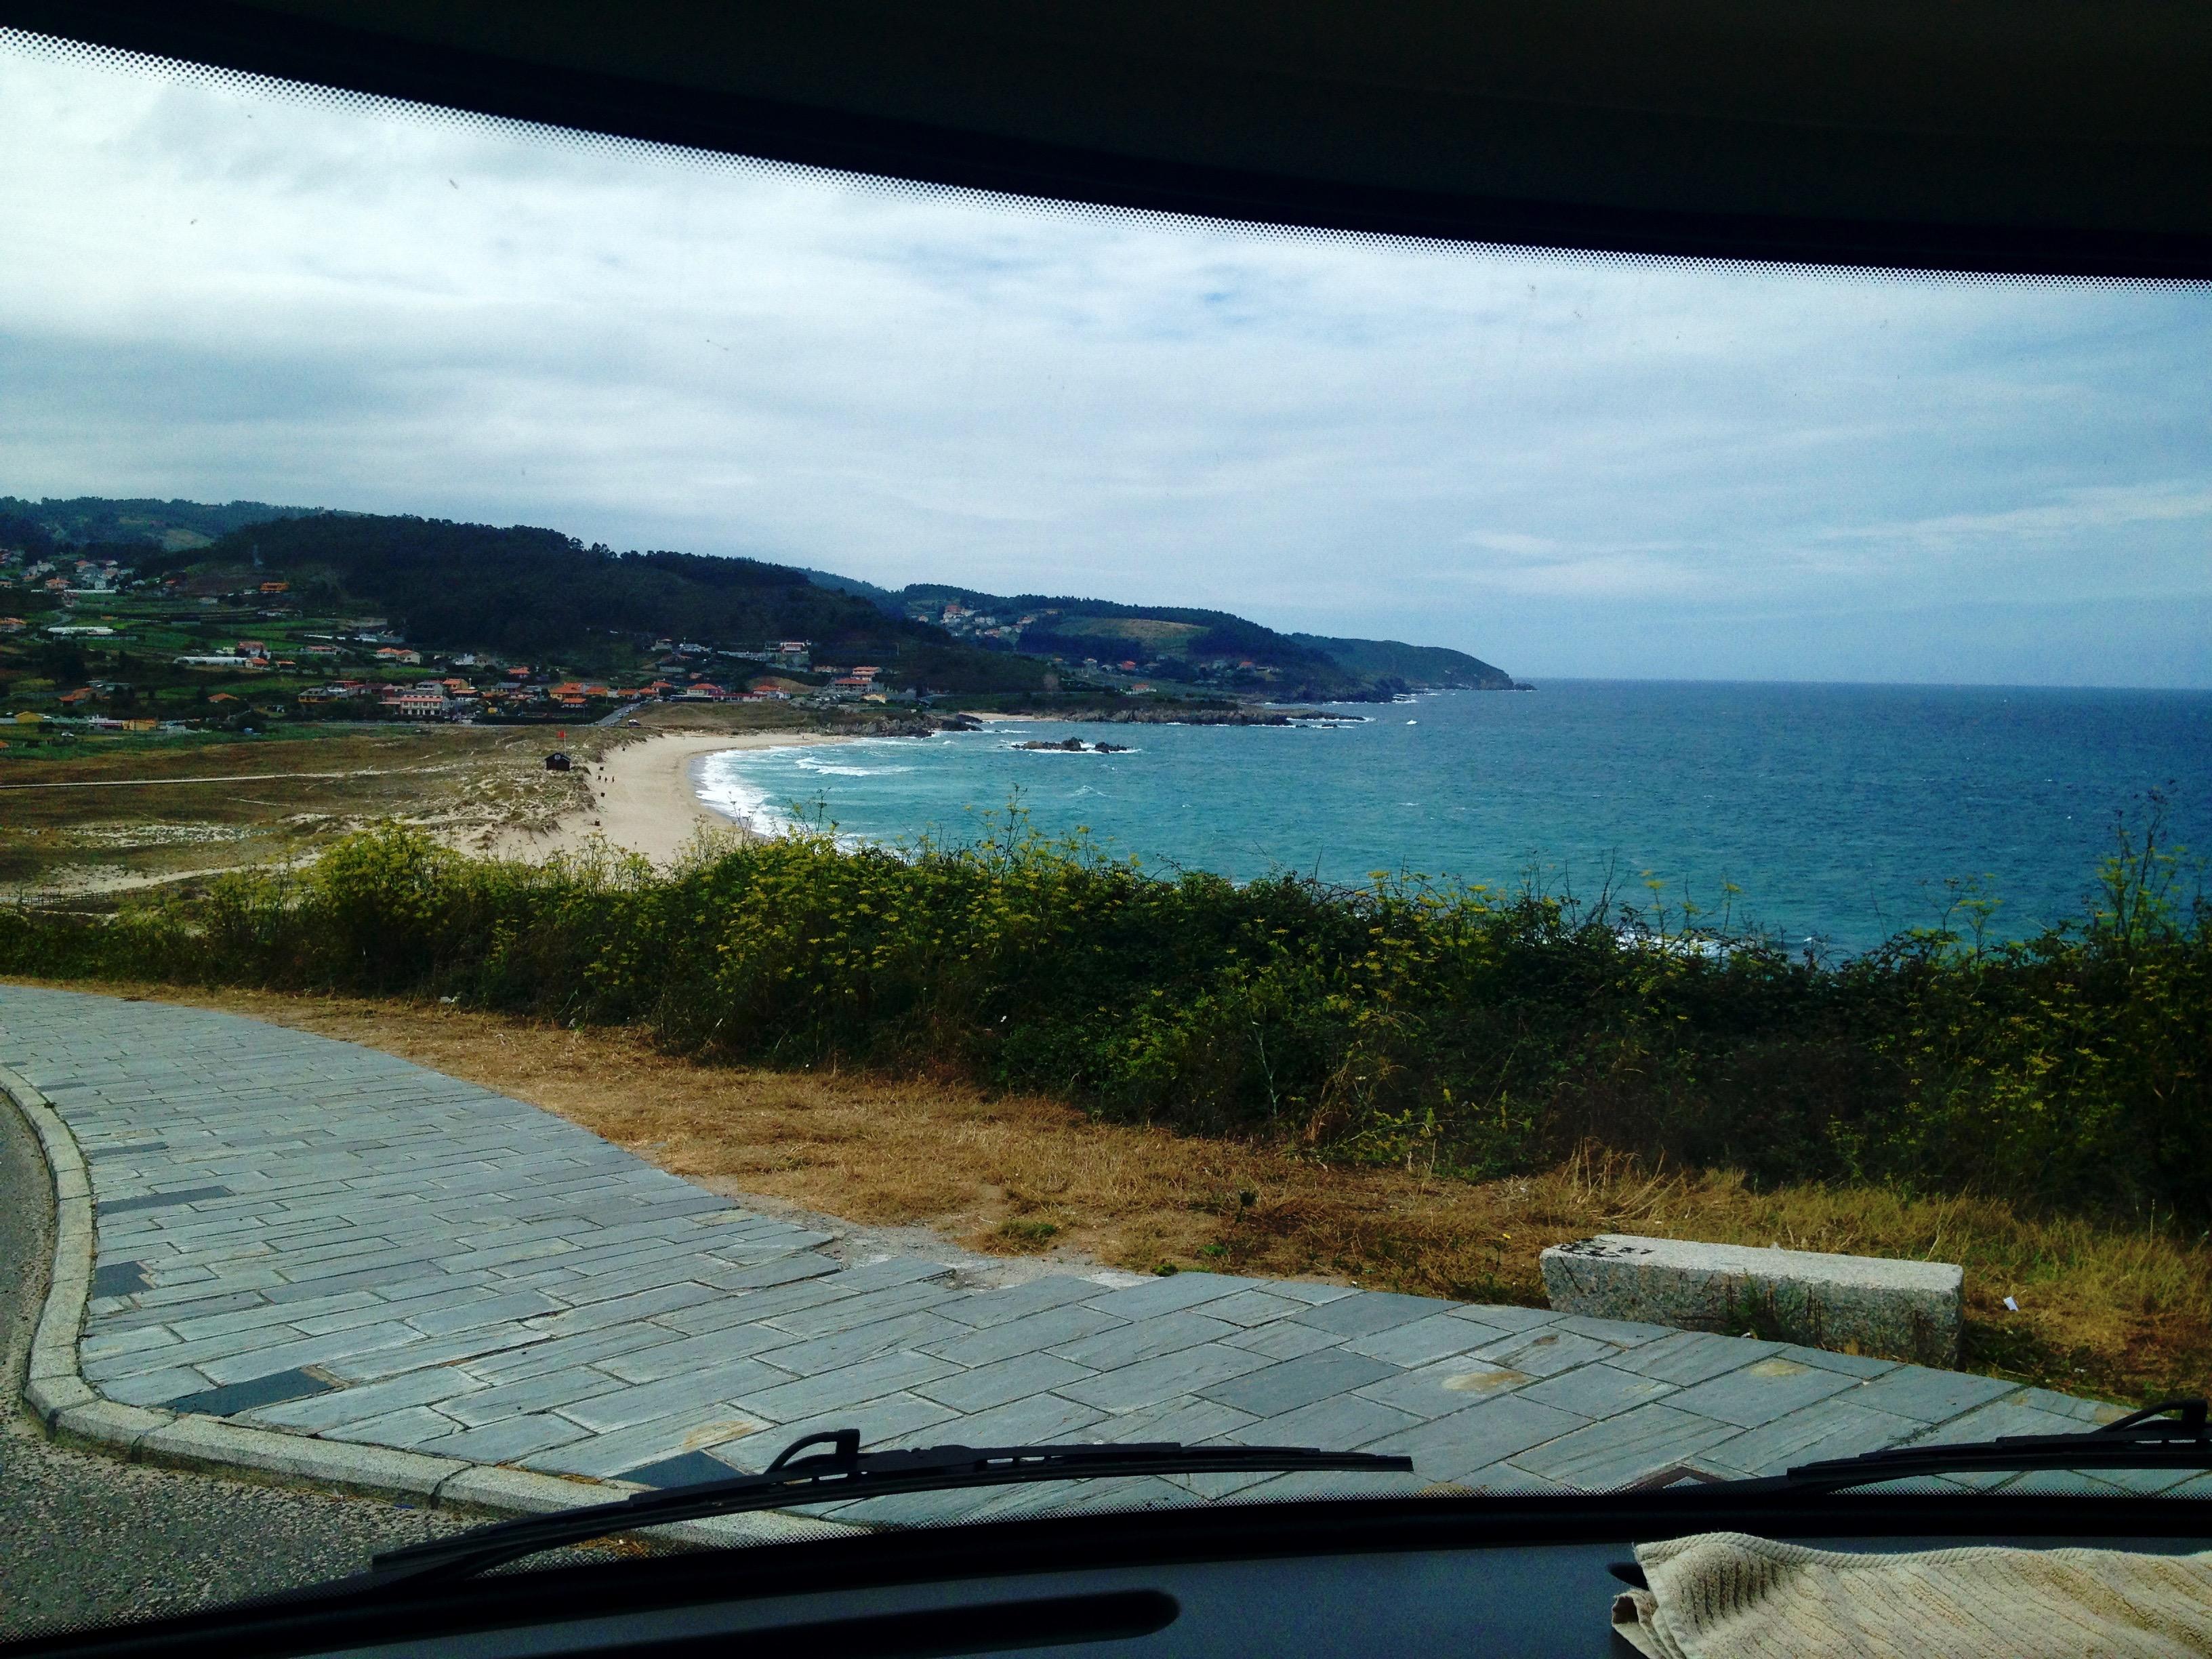 Overlooking the beach near Arteixo, Galicia, Spain.